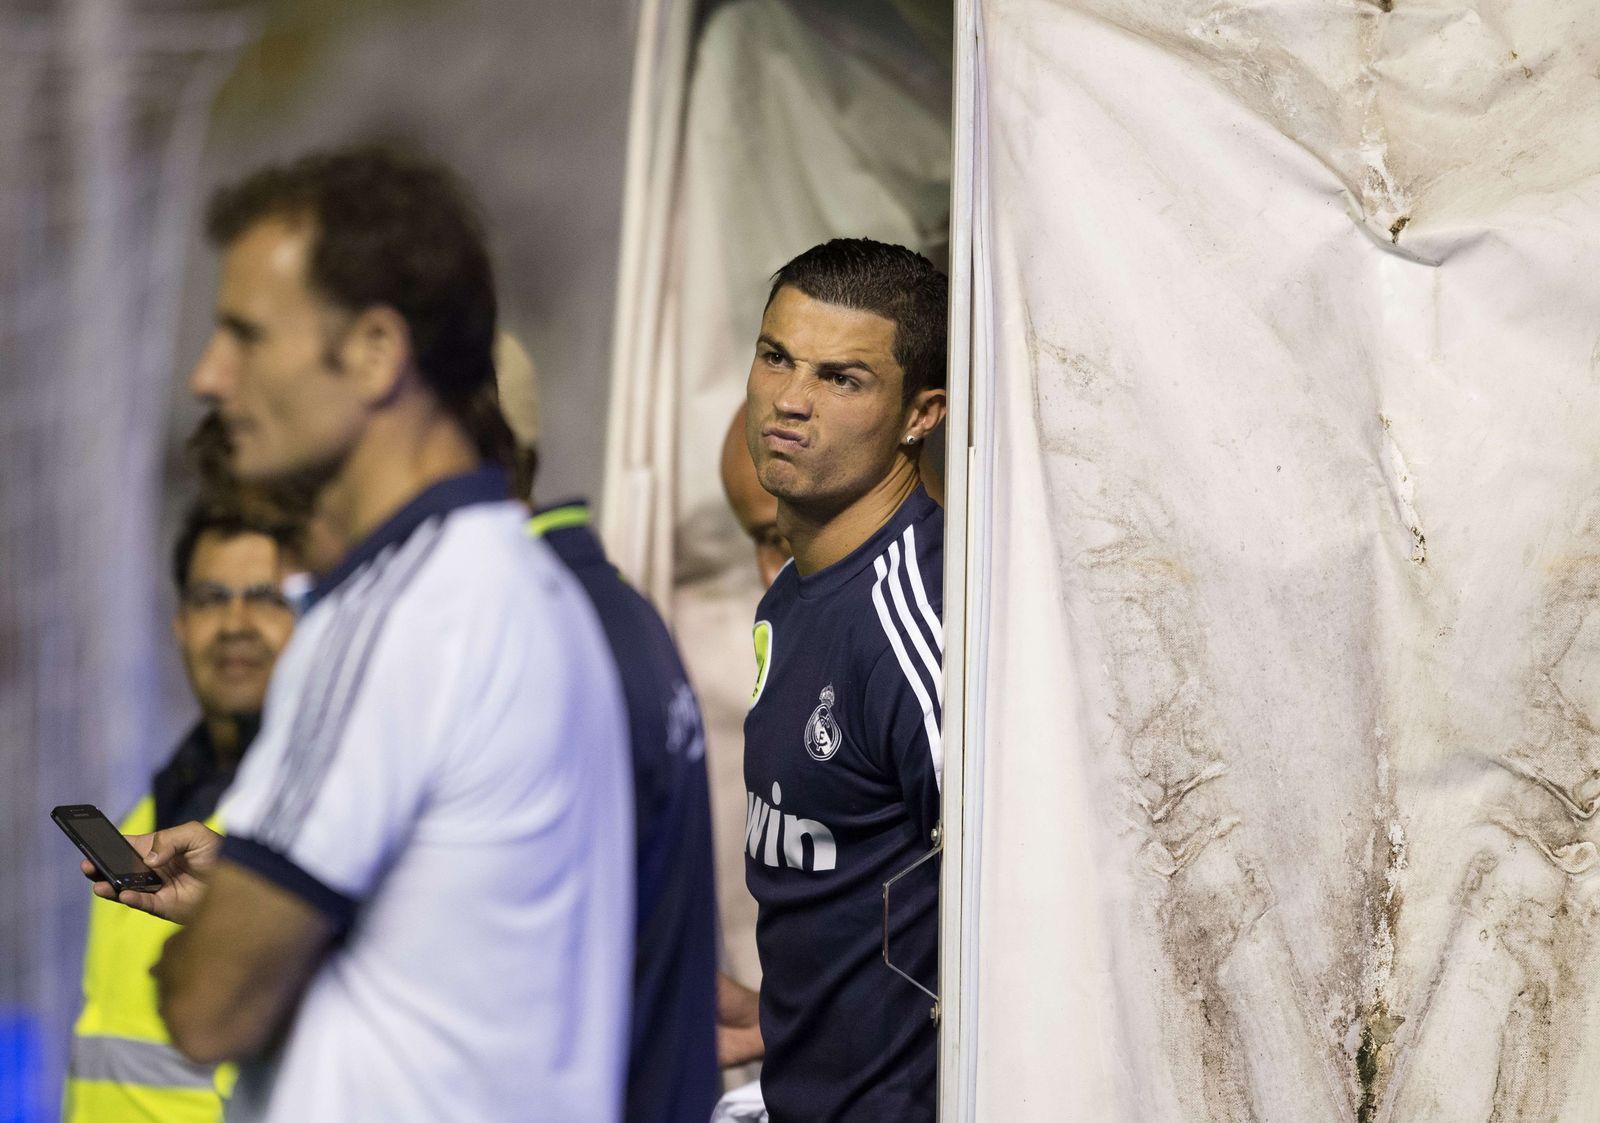 Real/Ronaldo